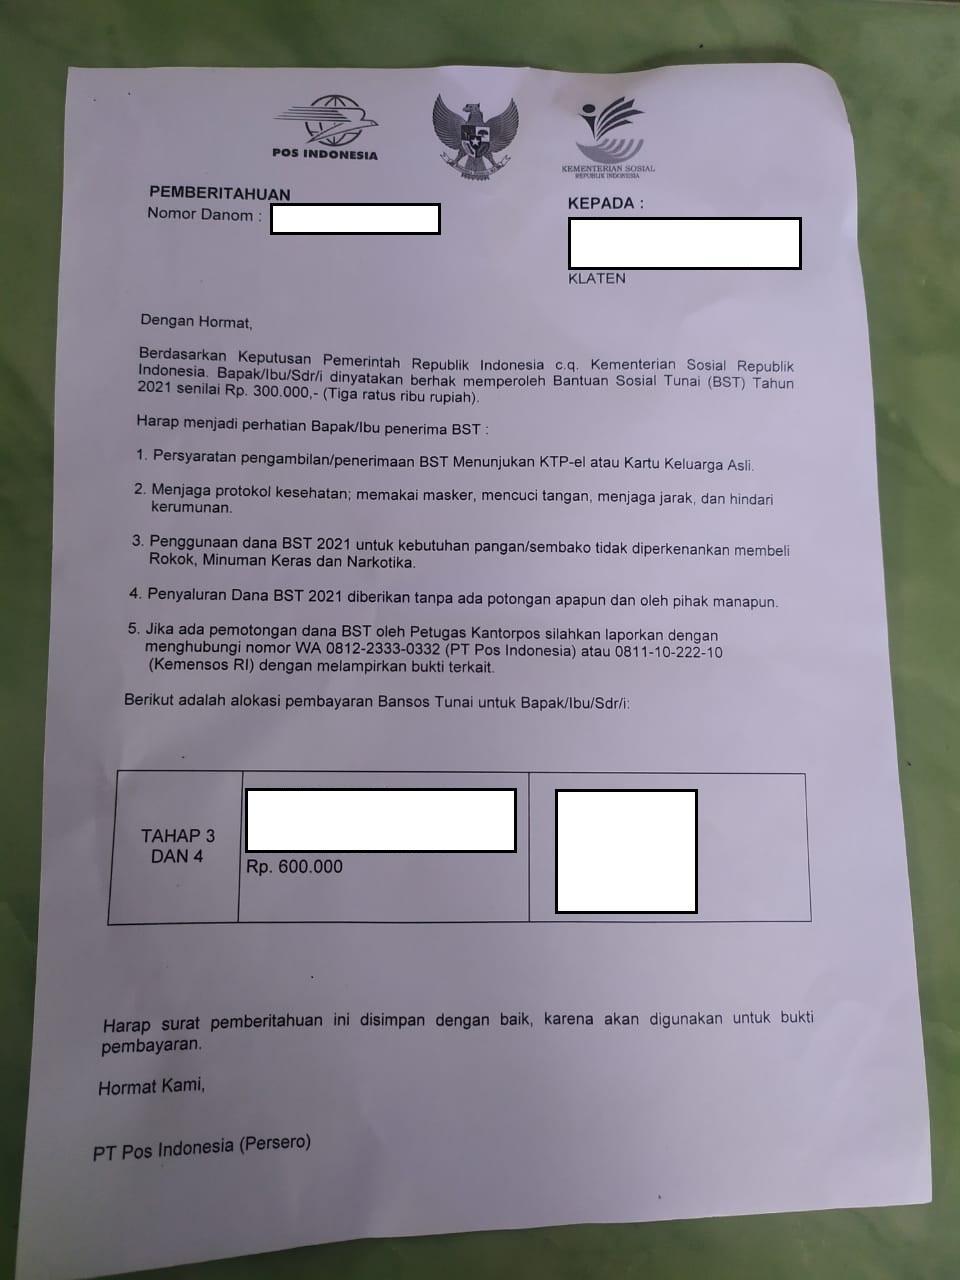 Surat undangan untuk pencairan bansos tunai Rp 300 ribu di kantor kelurahan.